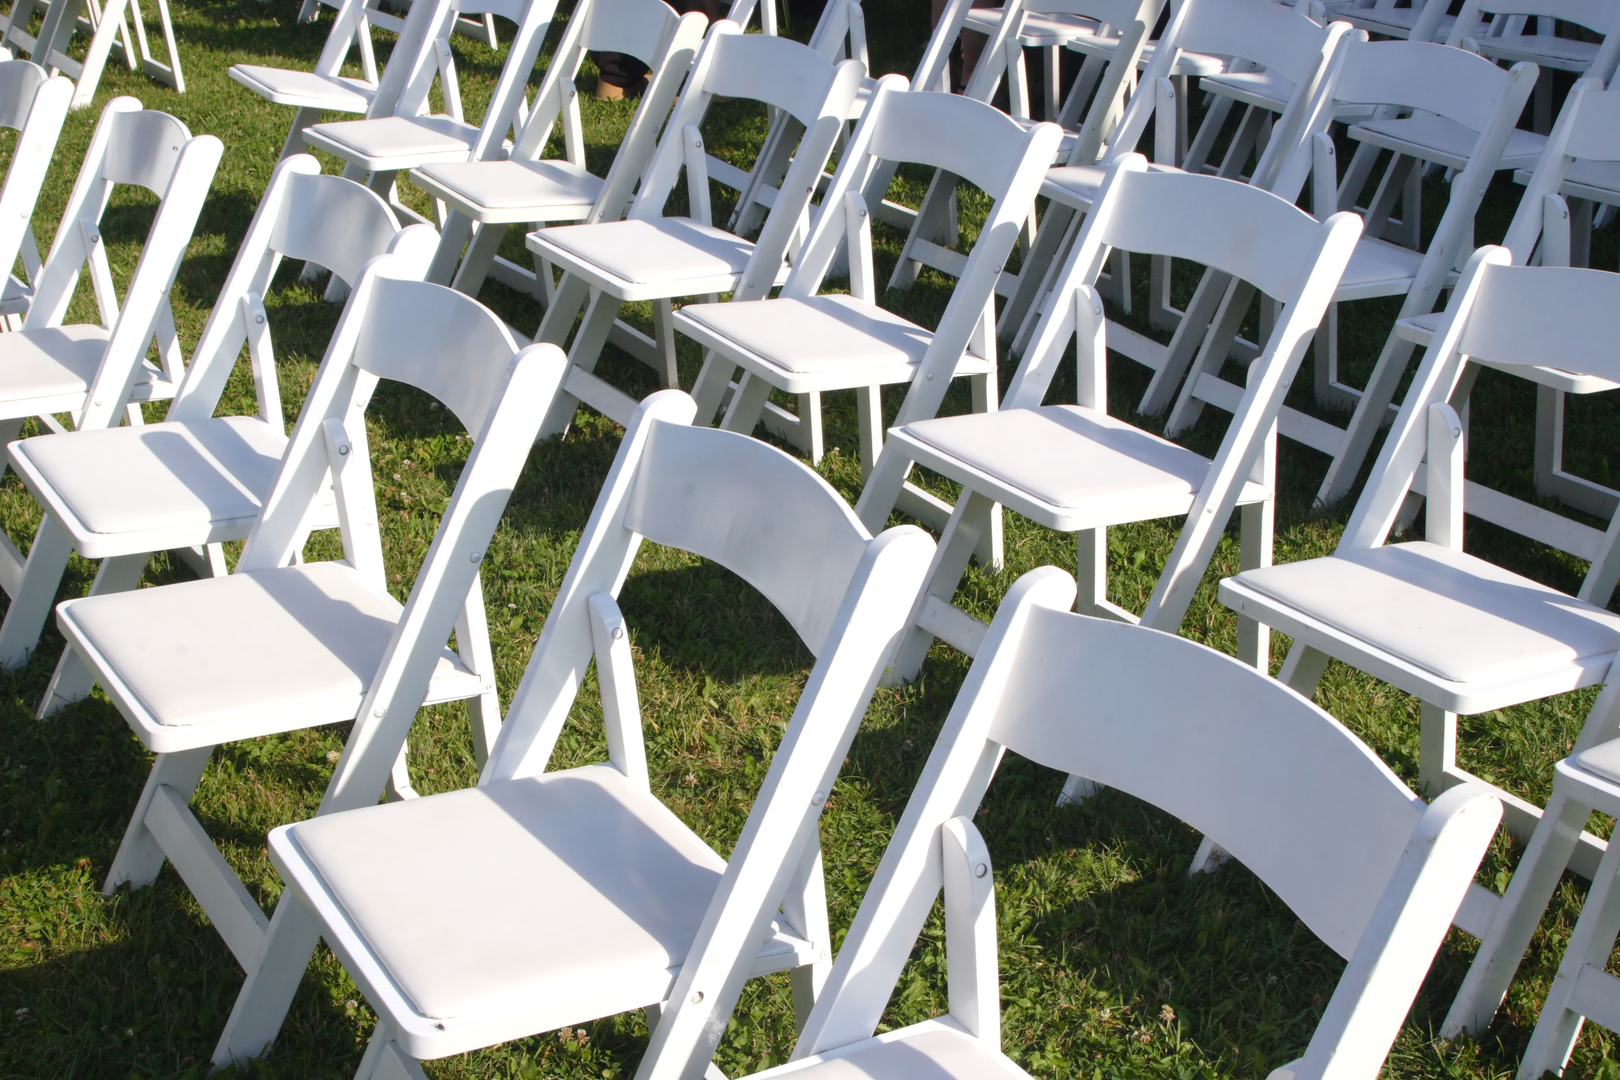 Wedding folding chair covers - Wedding Folding Chair Covers 31